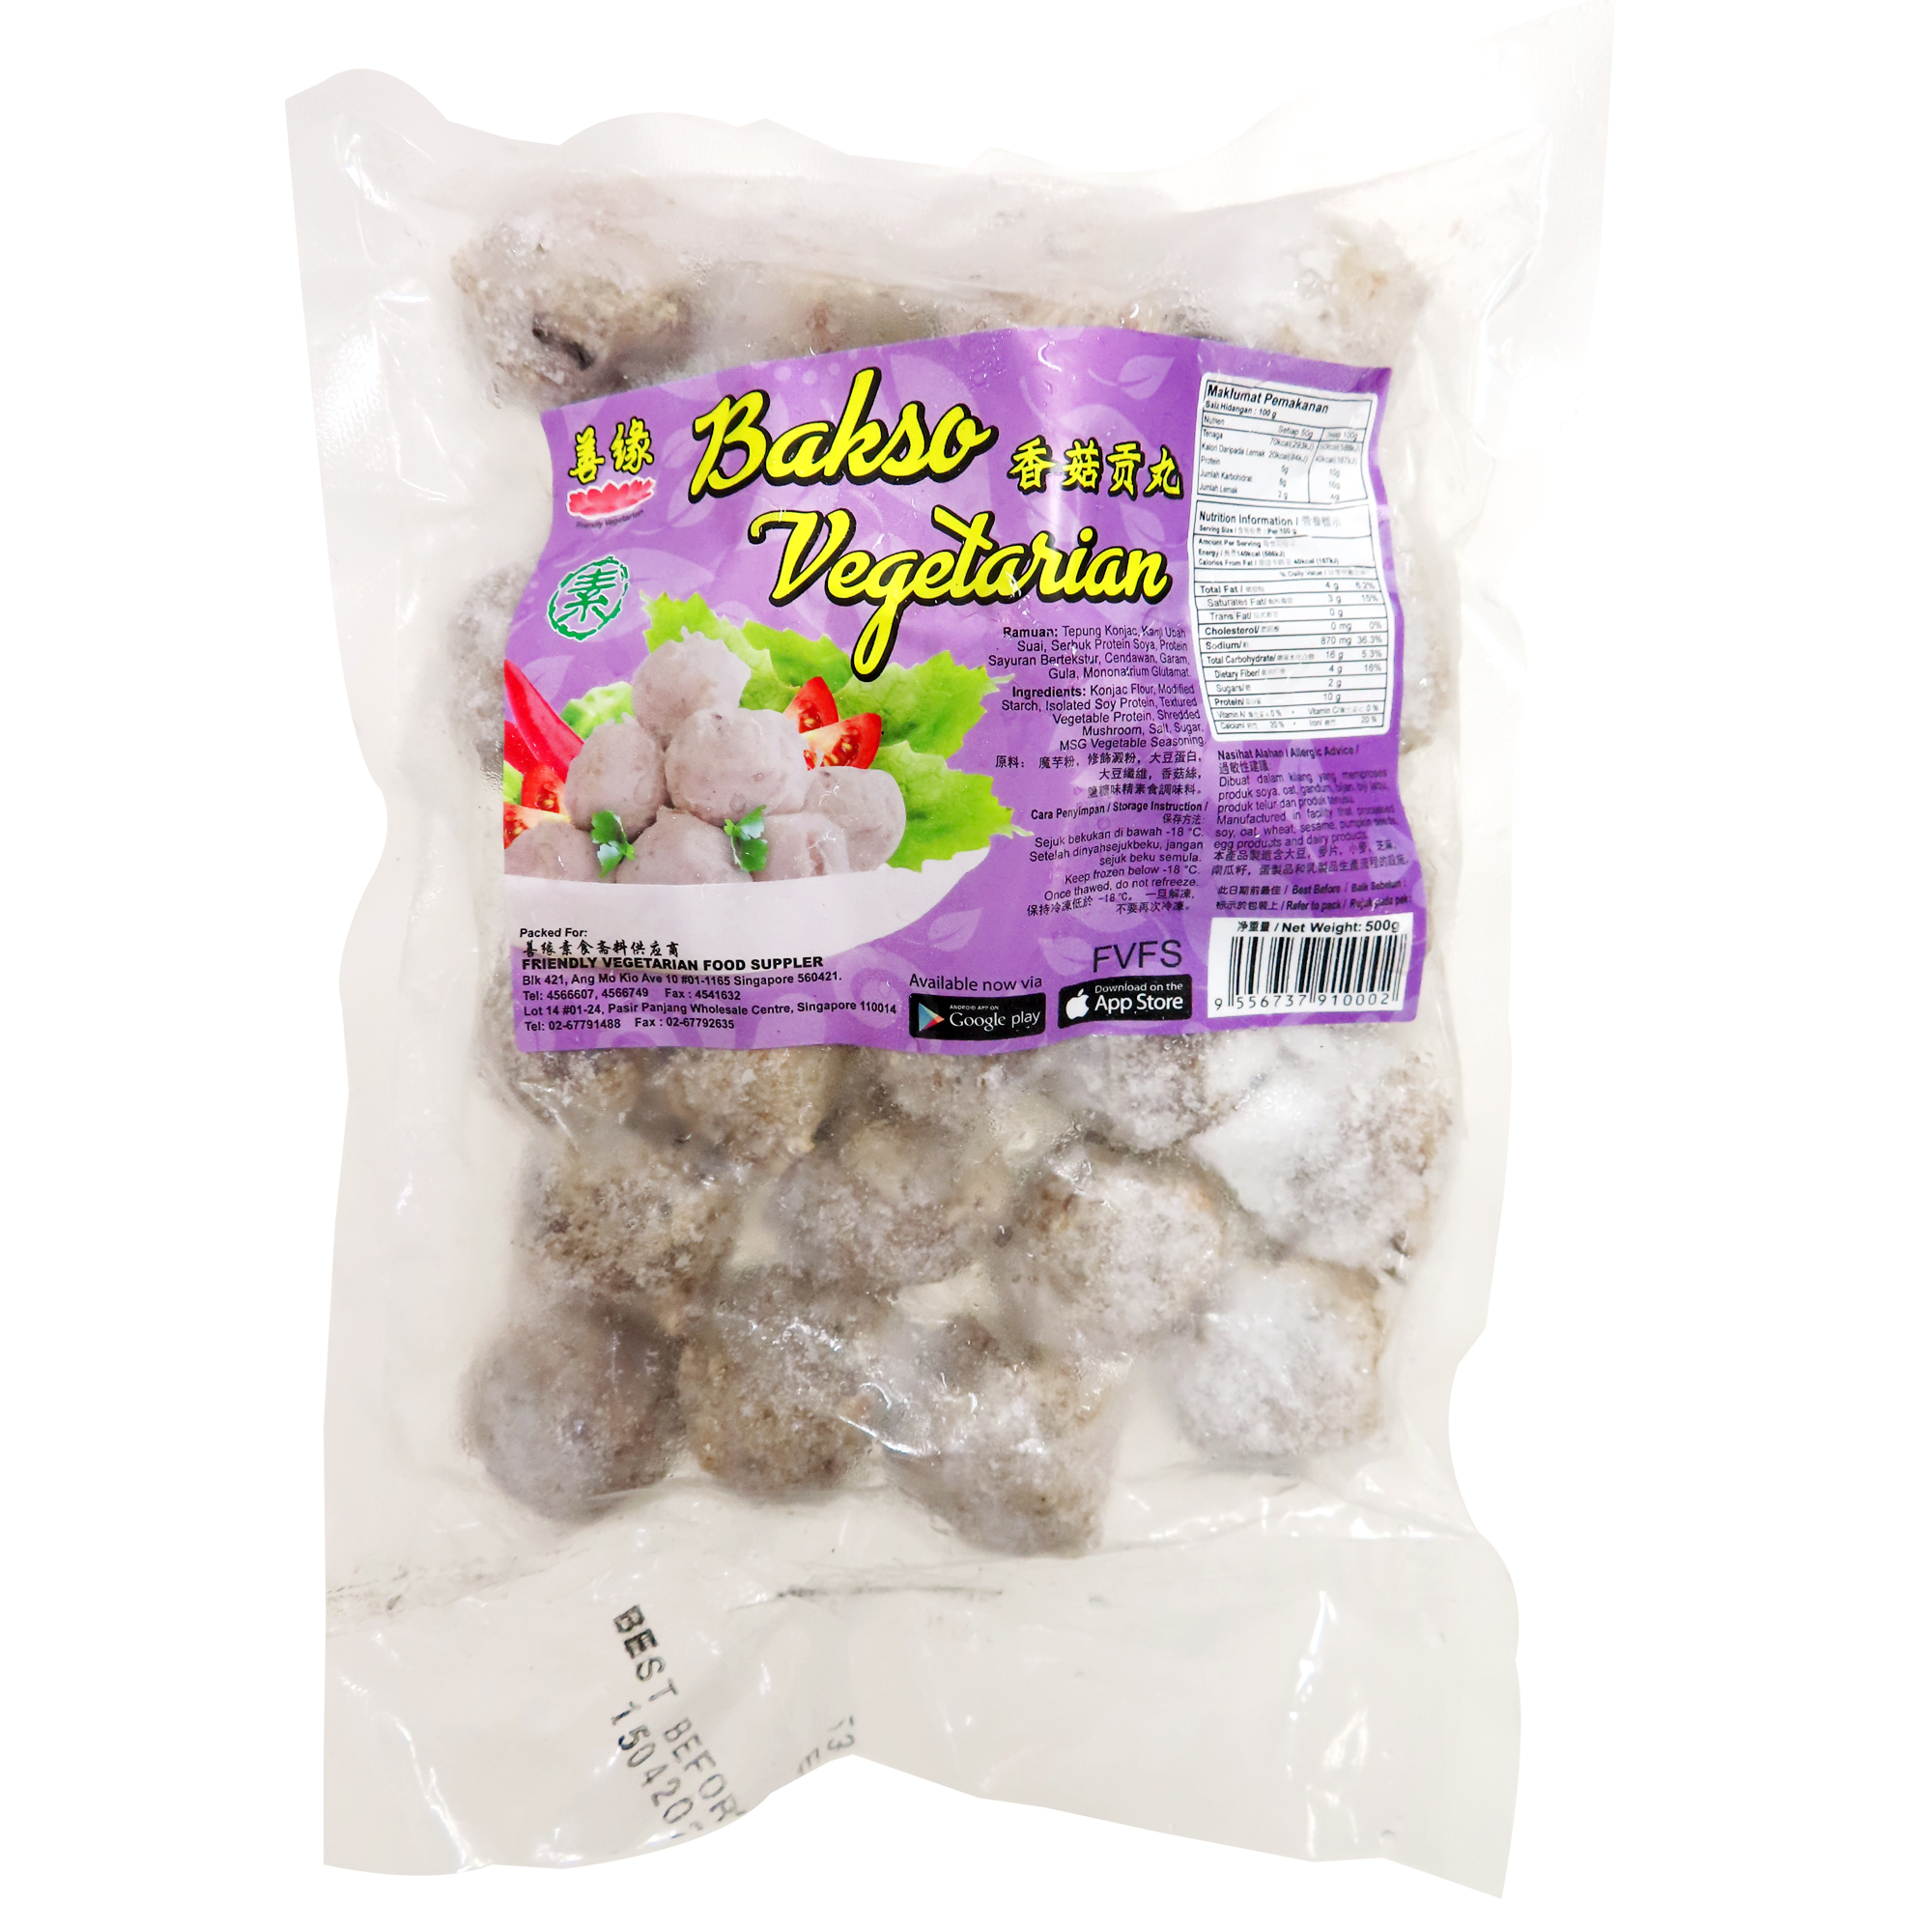 Image Bakso Mushroom Ball 善缘 - 香菇贡丸 (纯素) 500grams